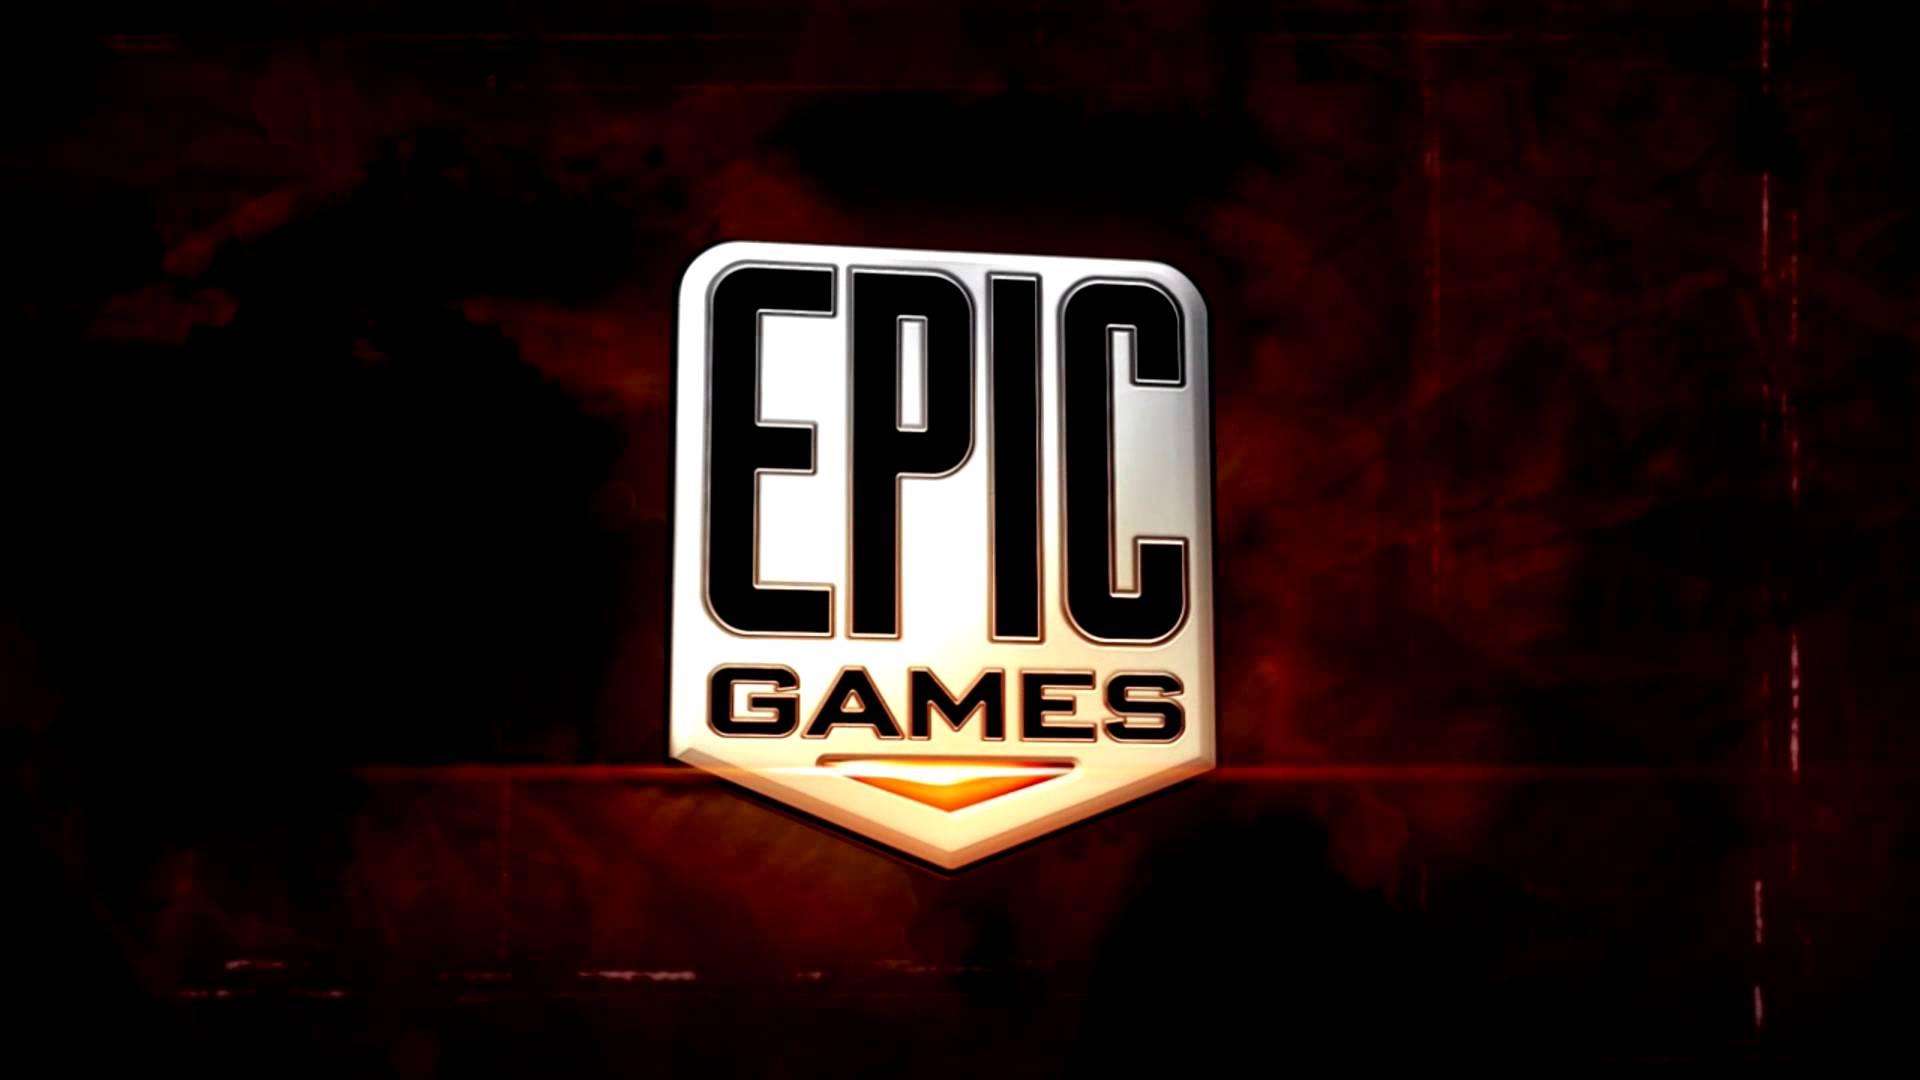 epic games uvelichivaet dolyu na unreal engine marketplace blagodarya fortnite - unreal engine fortnite